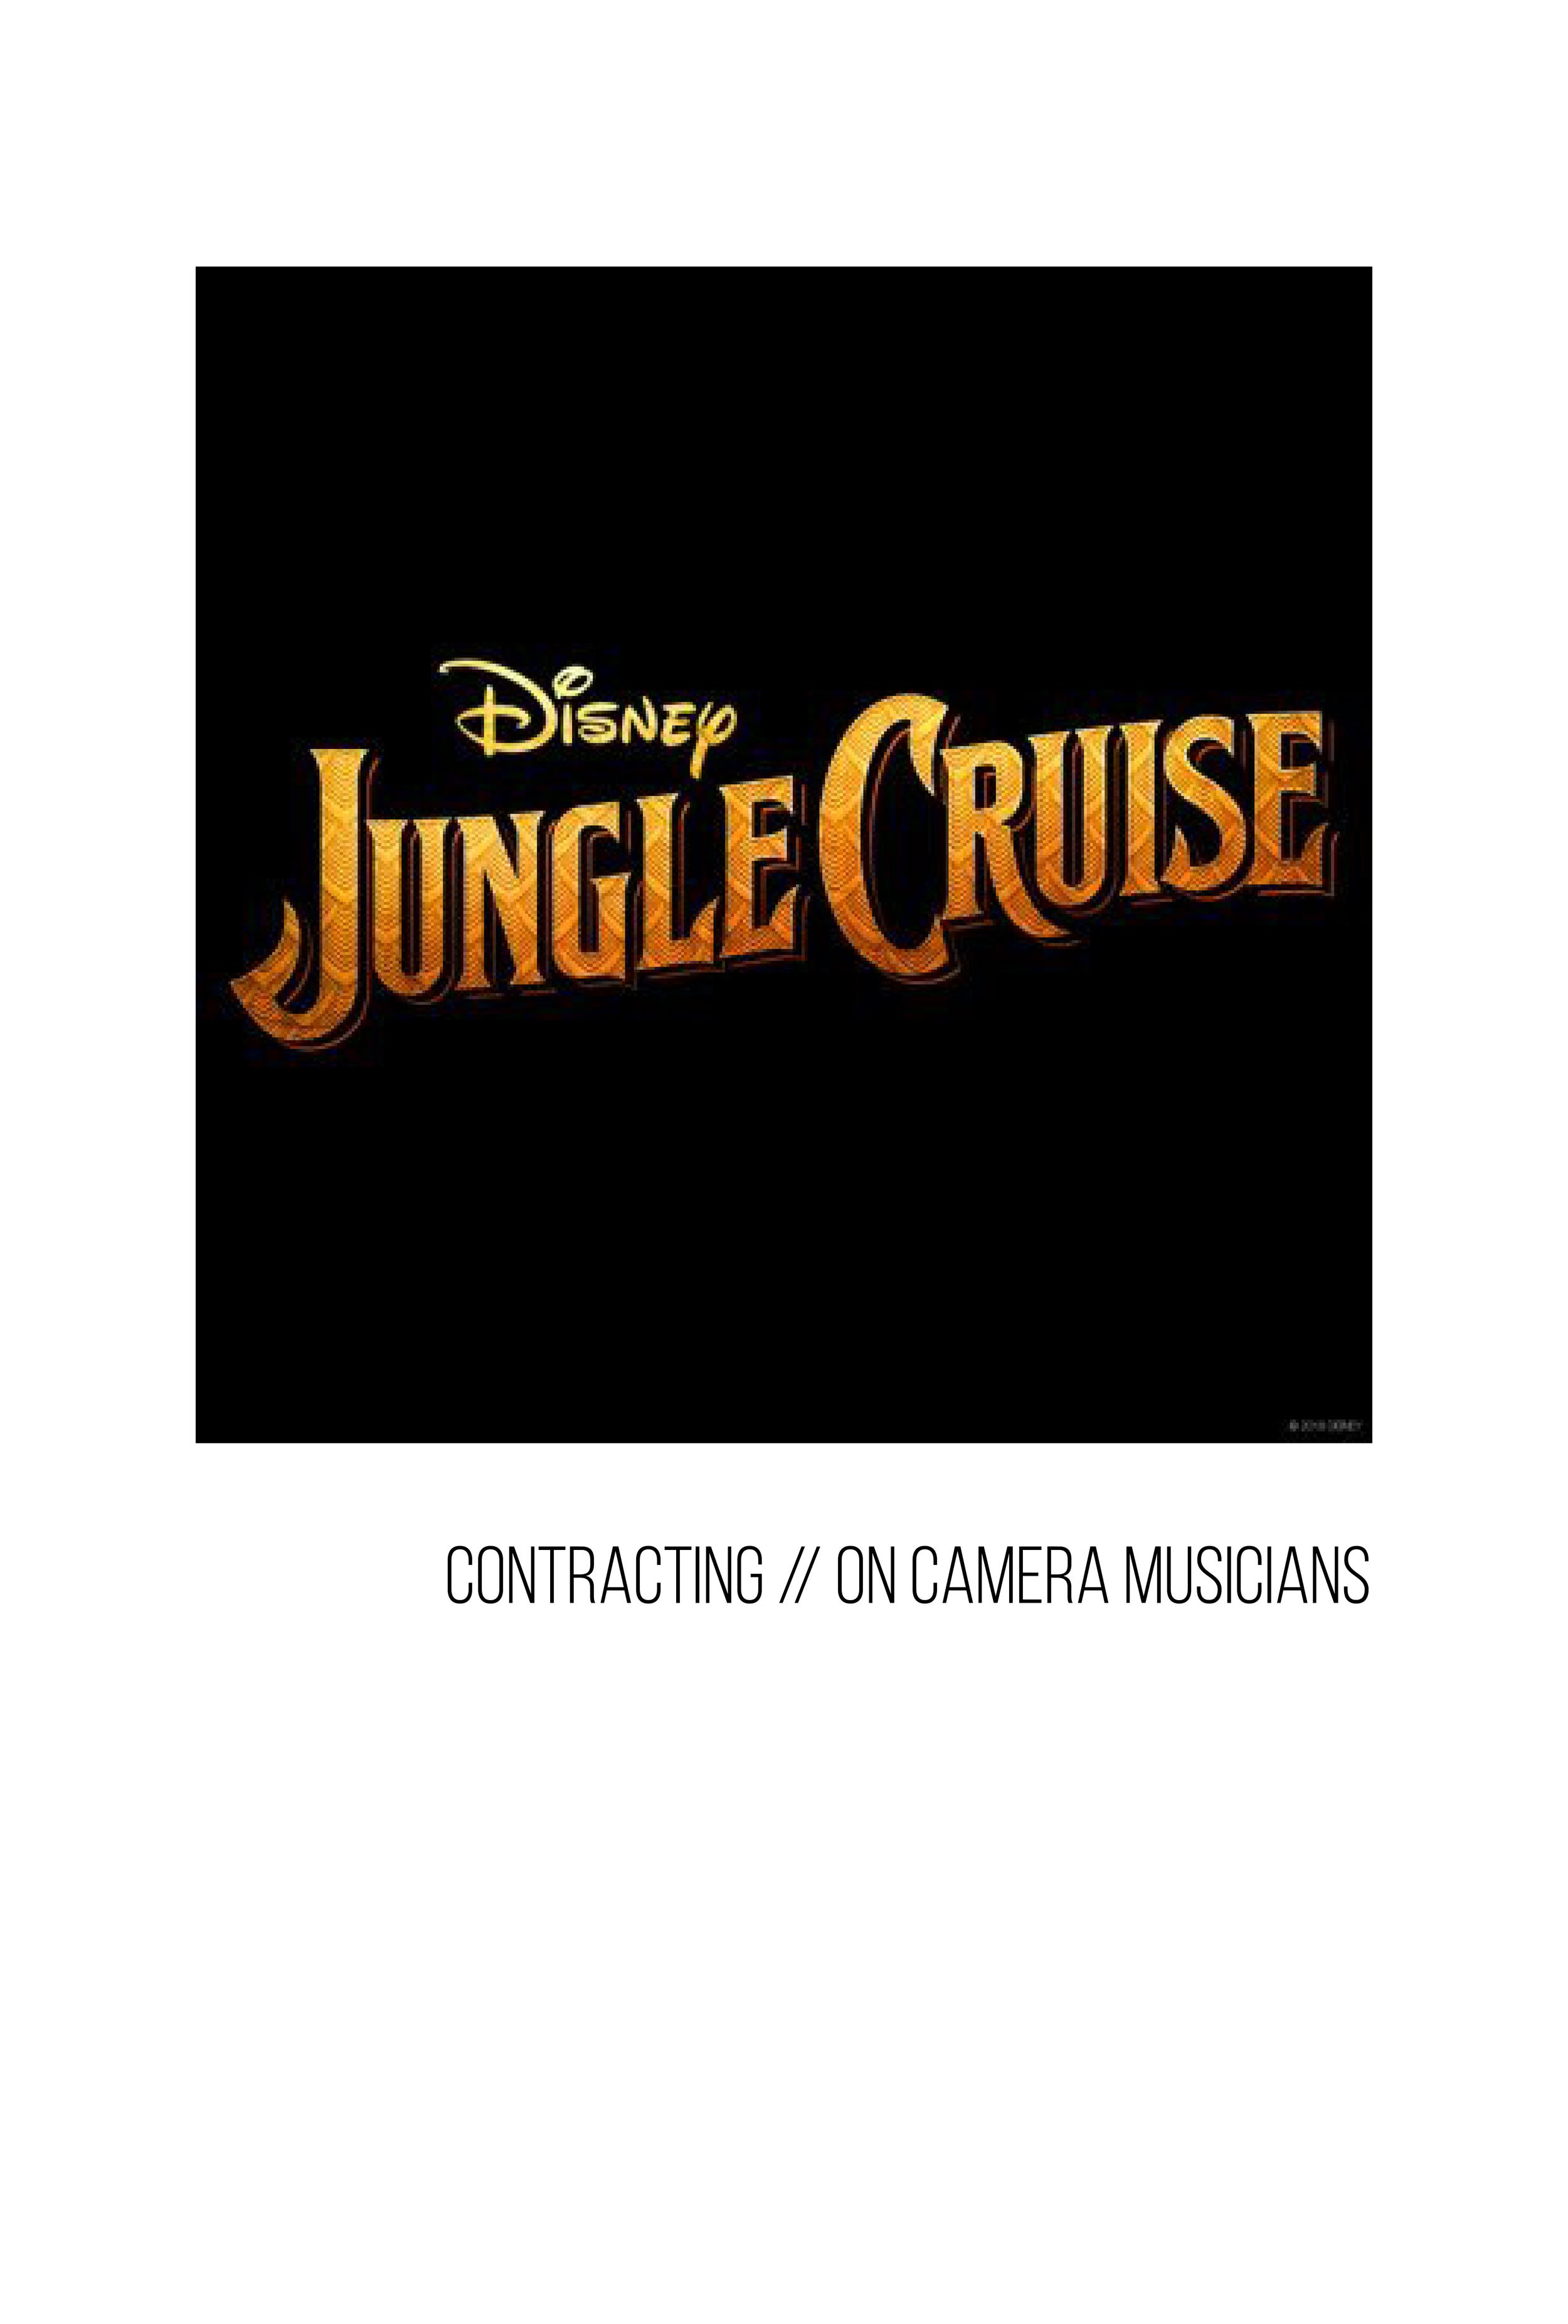 jungle cruise-01.png